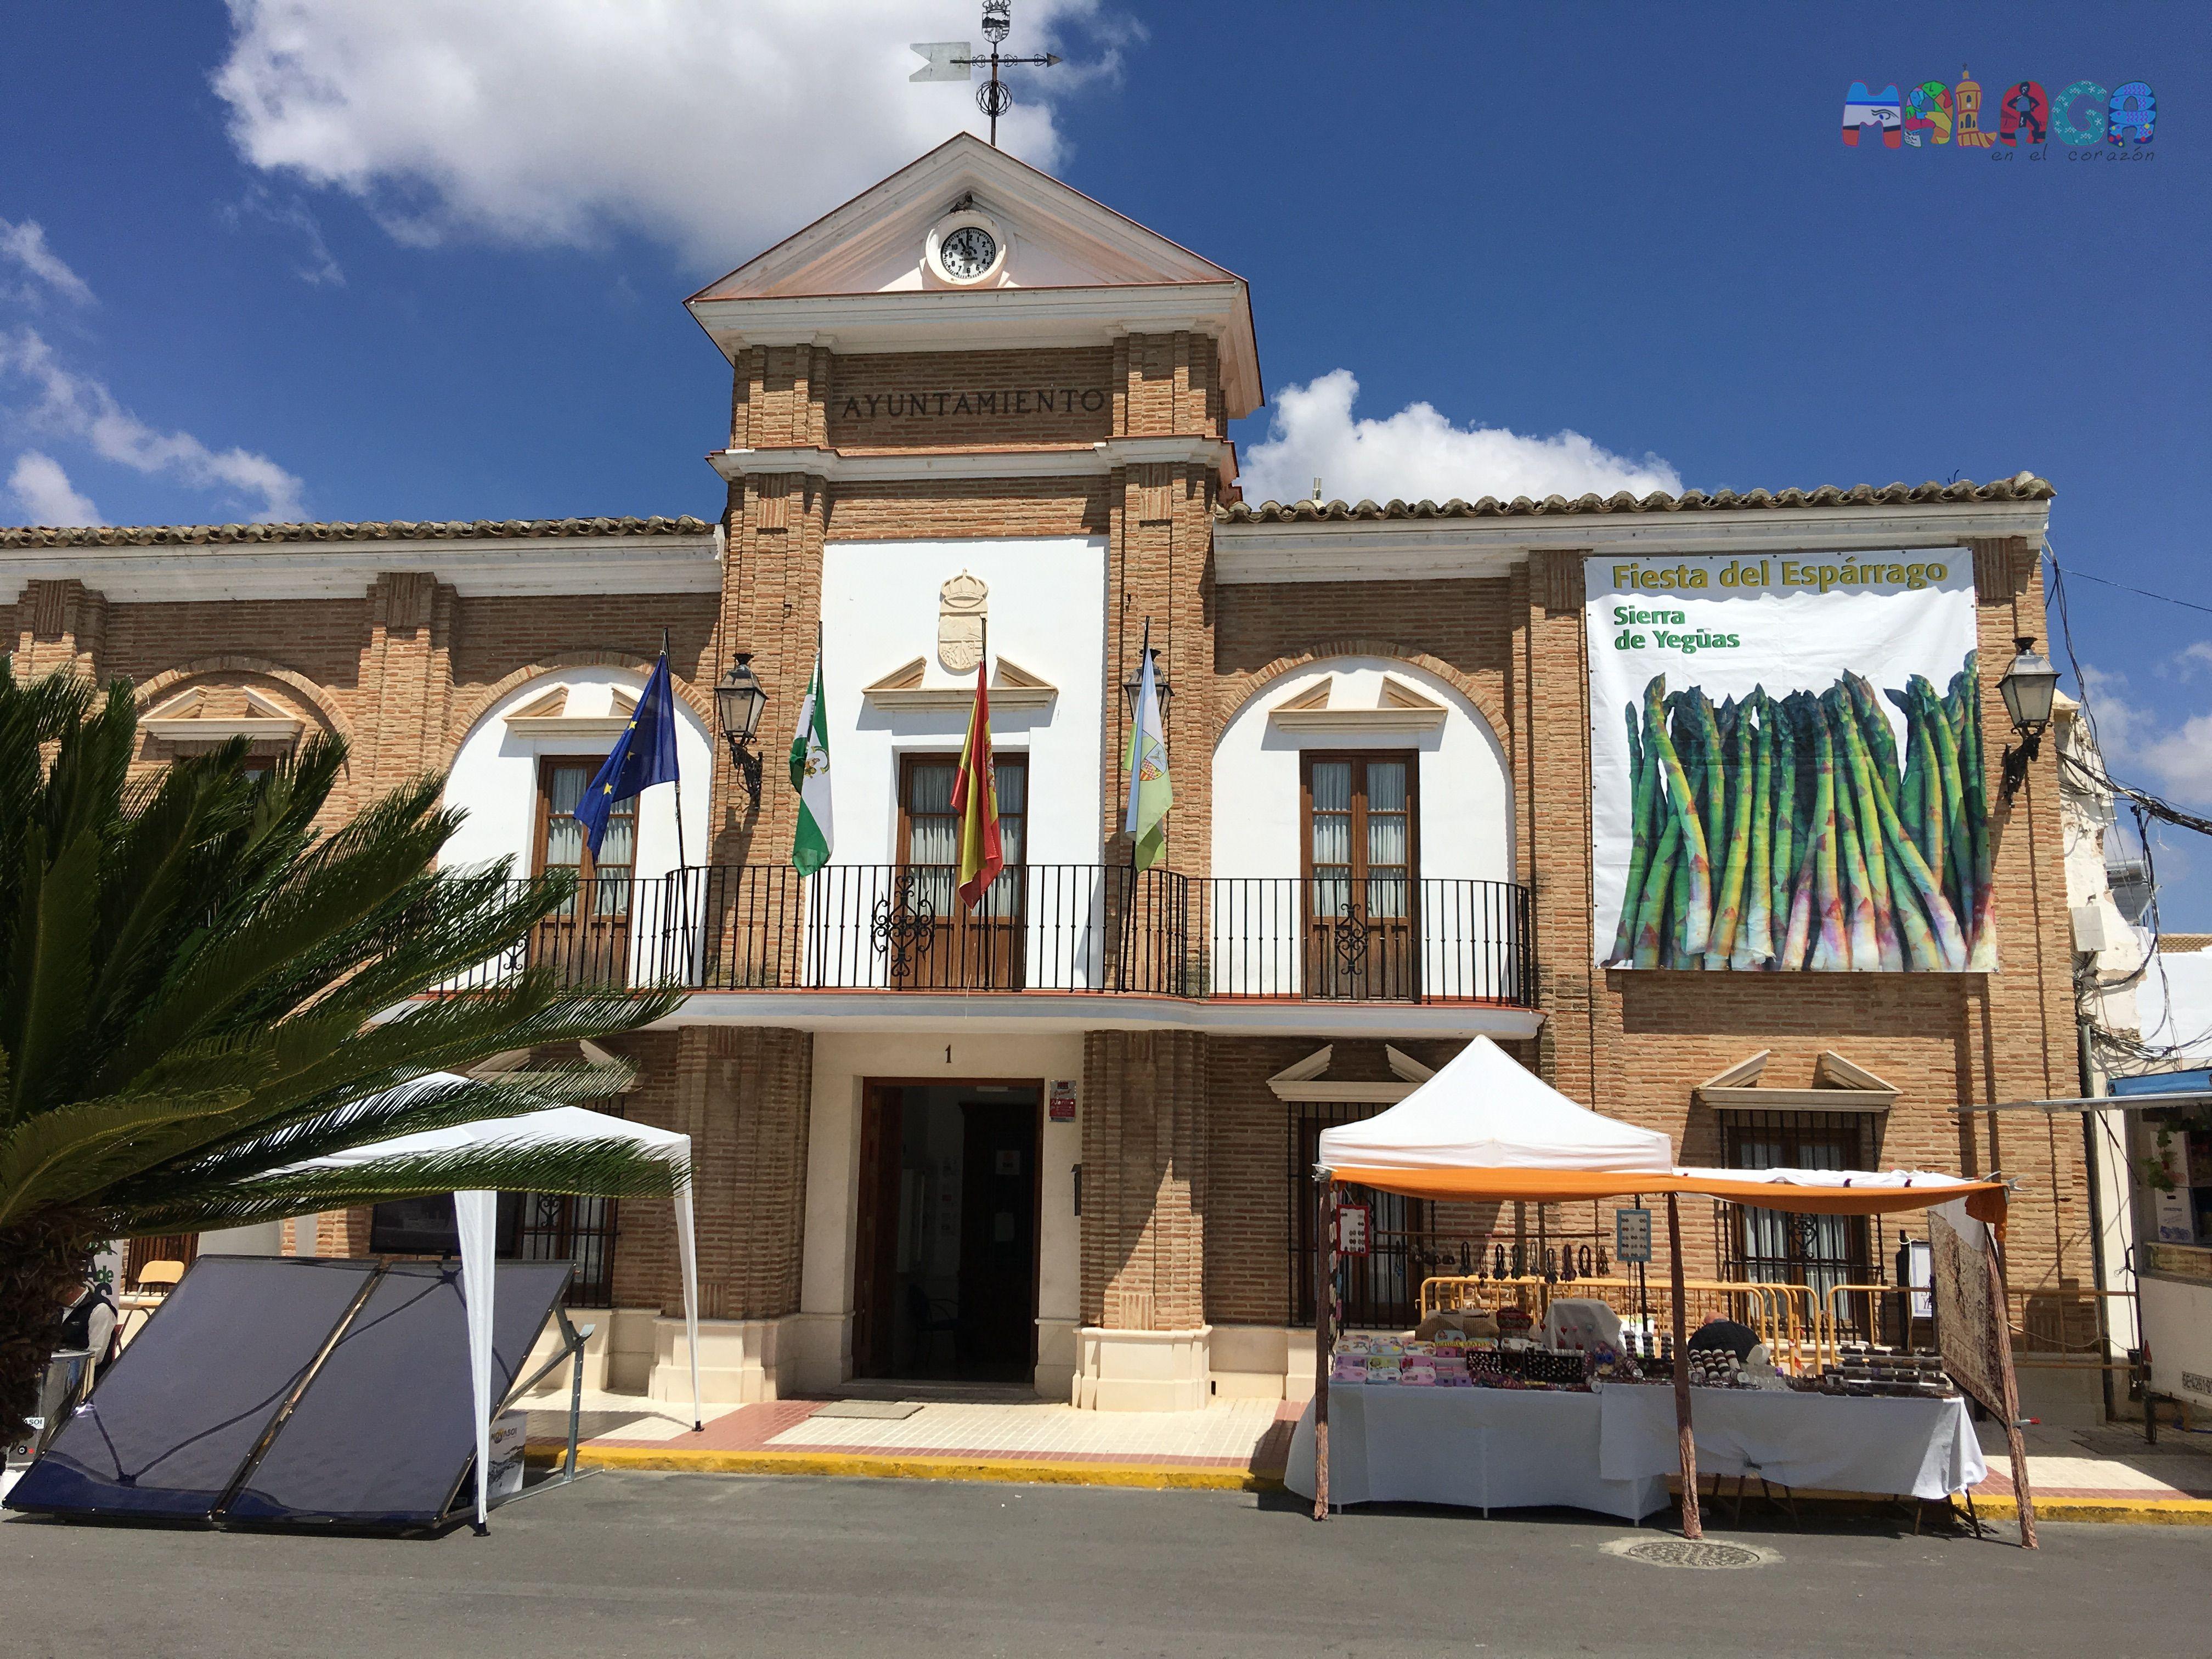 Sierra_de_yeguas_5